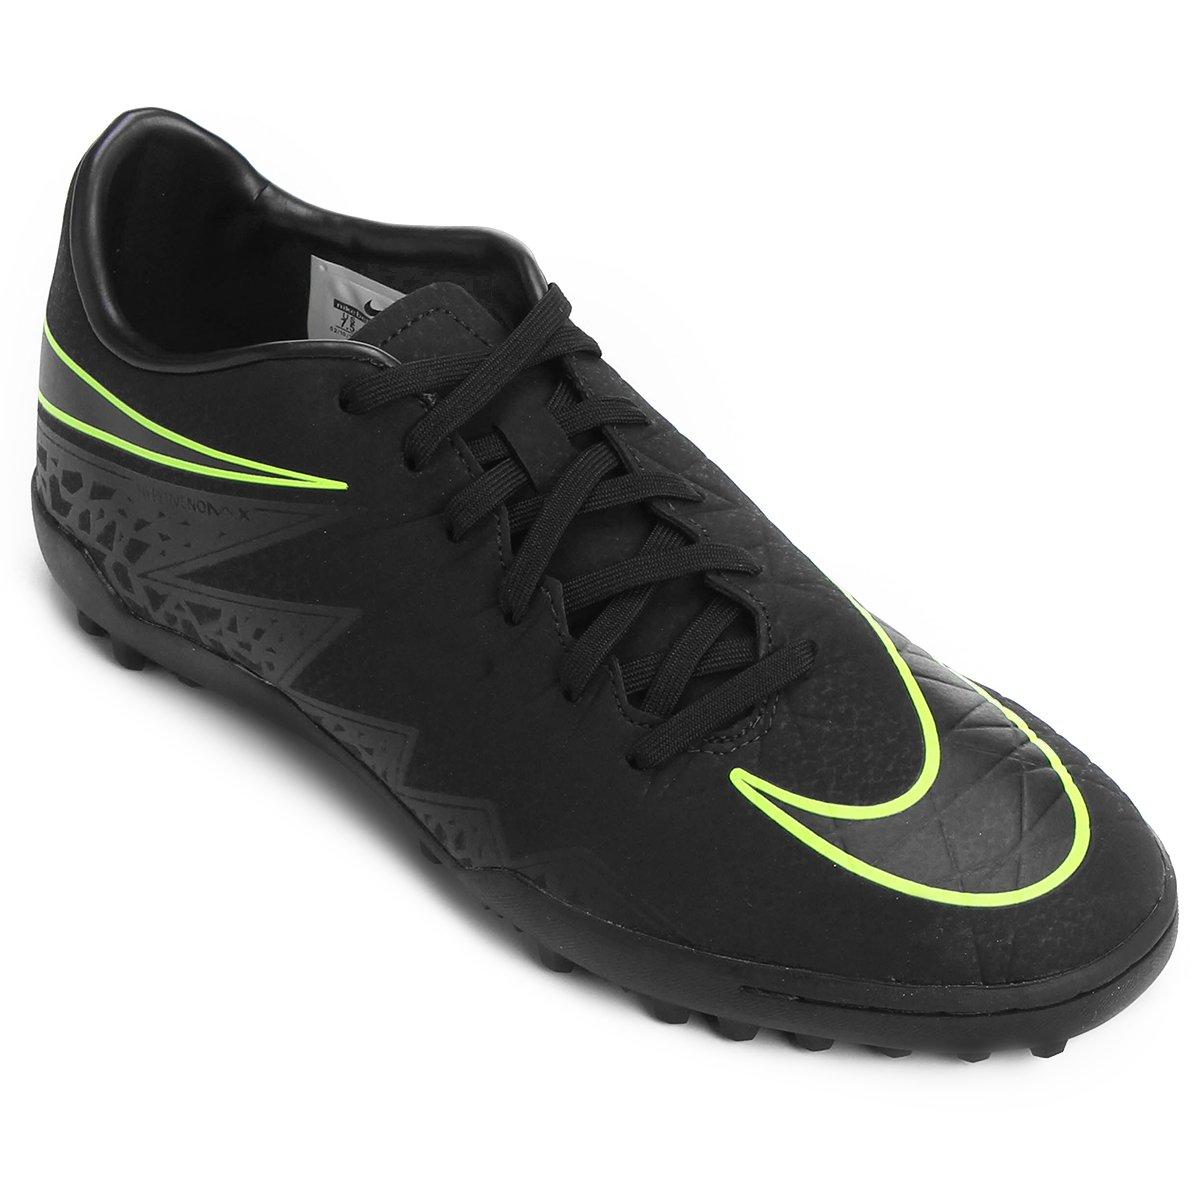 73dc3bfa0b6ef Chuteira Society Nike Hypervenom Phelon 2 TF - Compre Agora